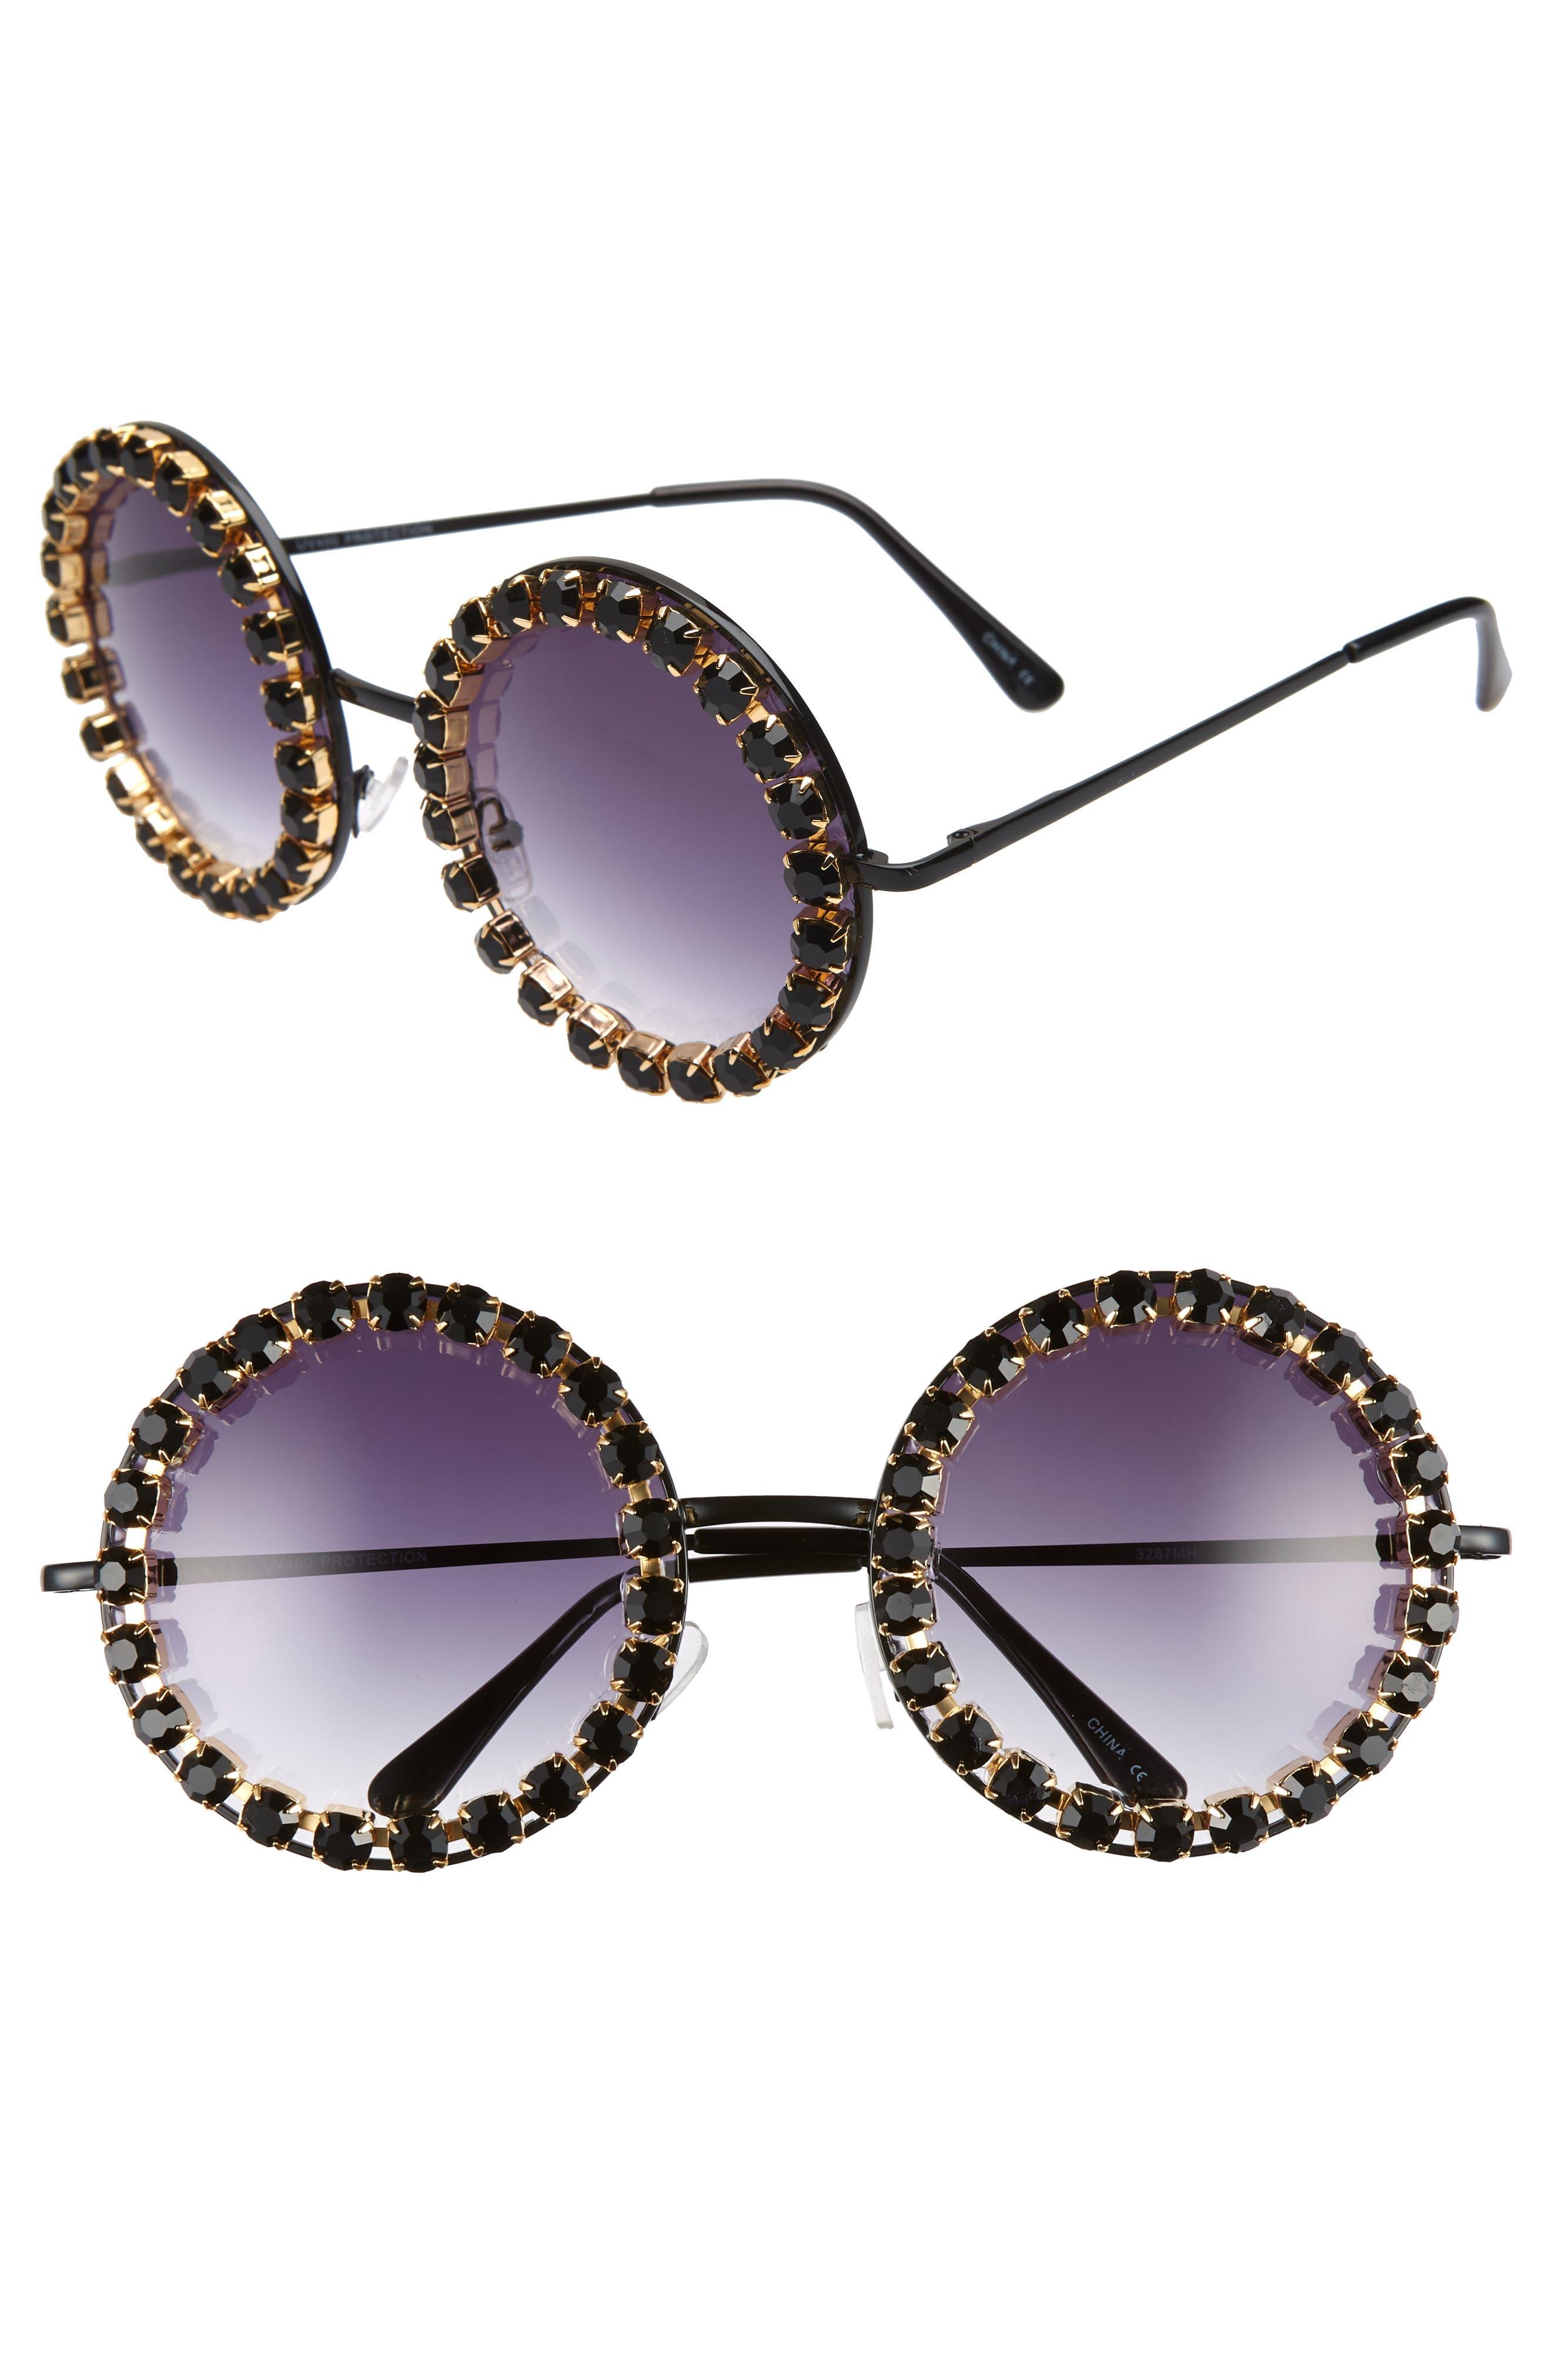 Rad + Refined Rhinestone Round Sunglasses - Black